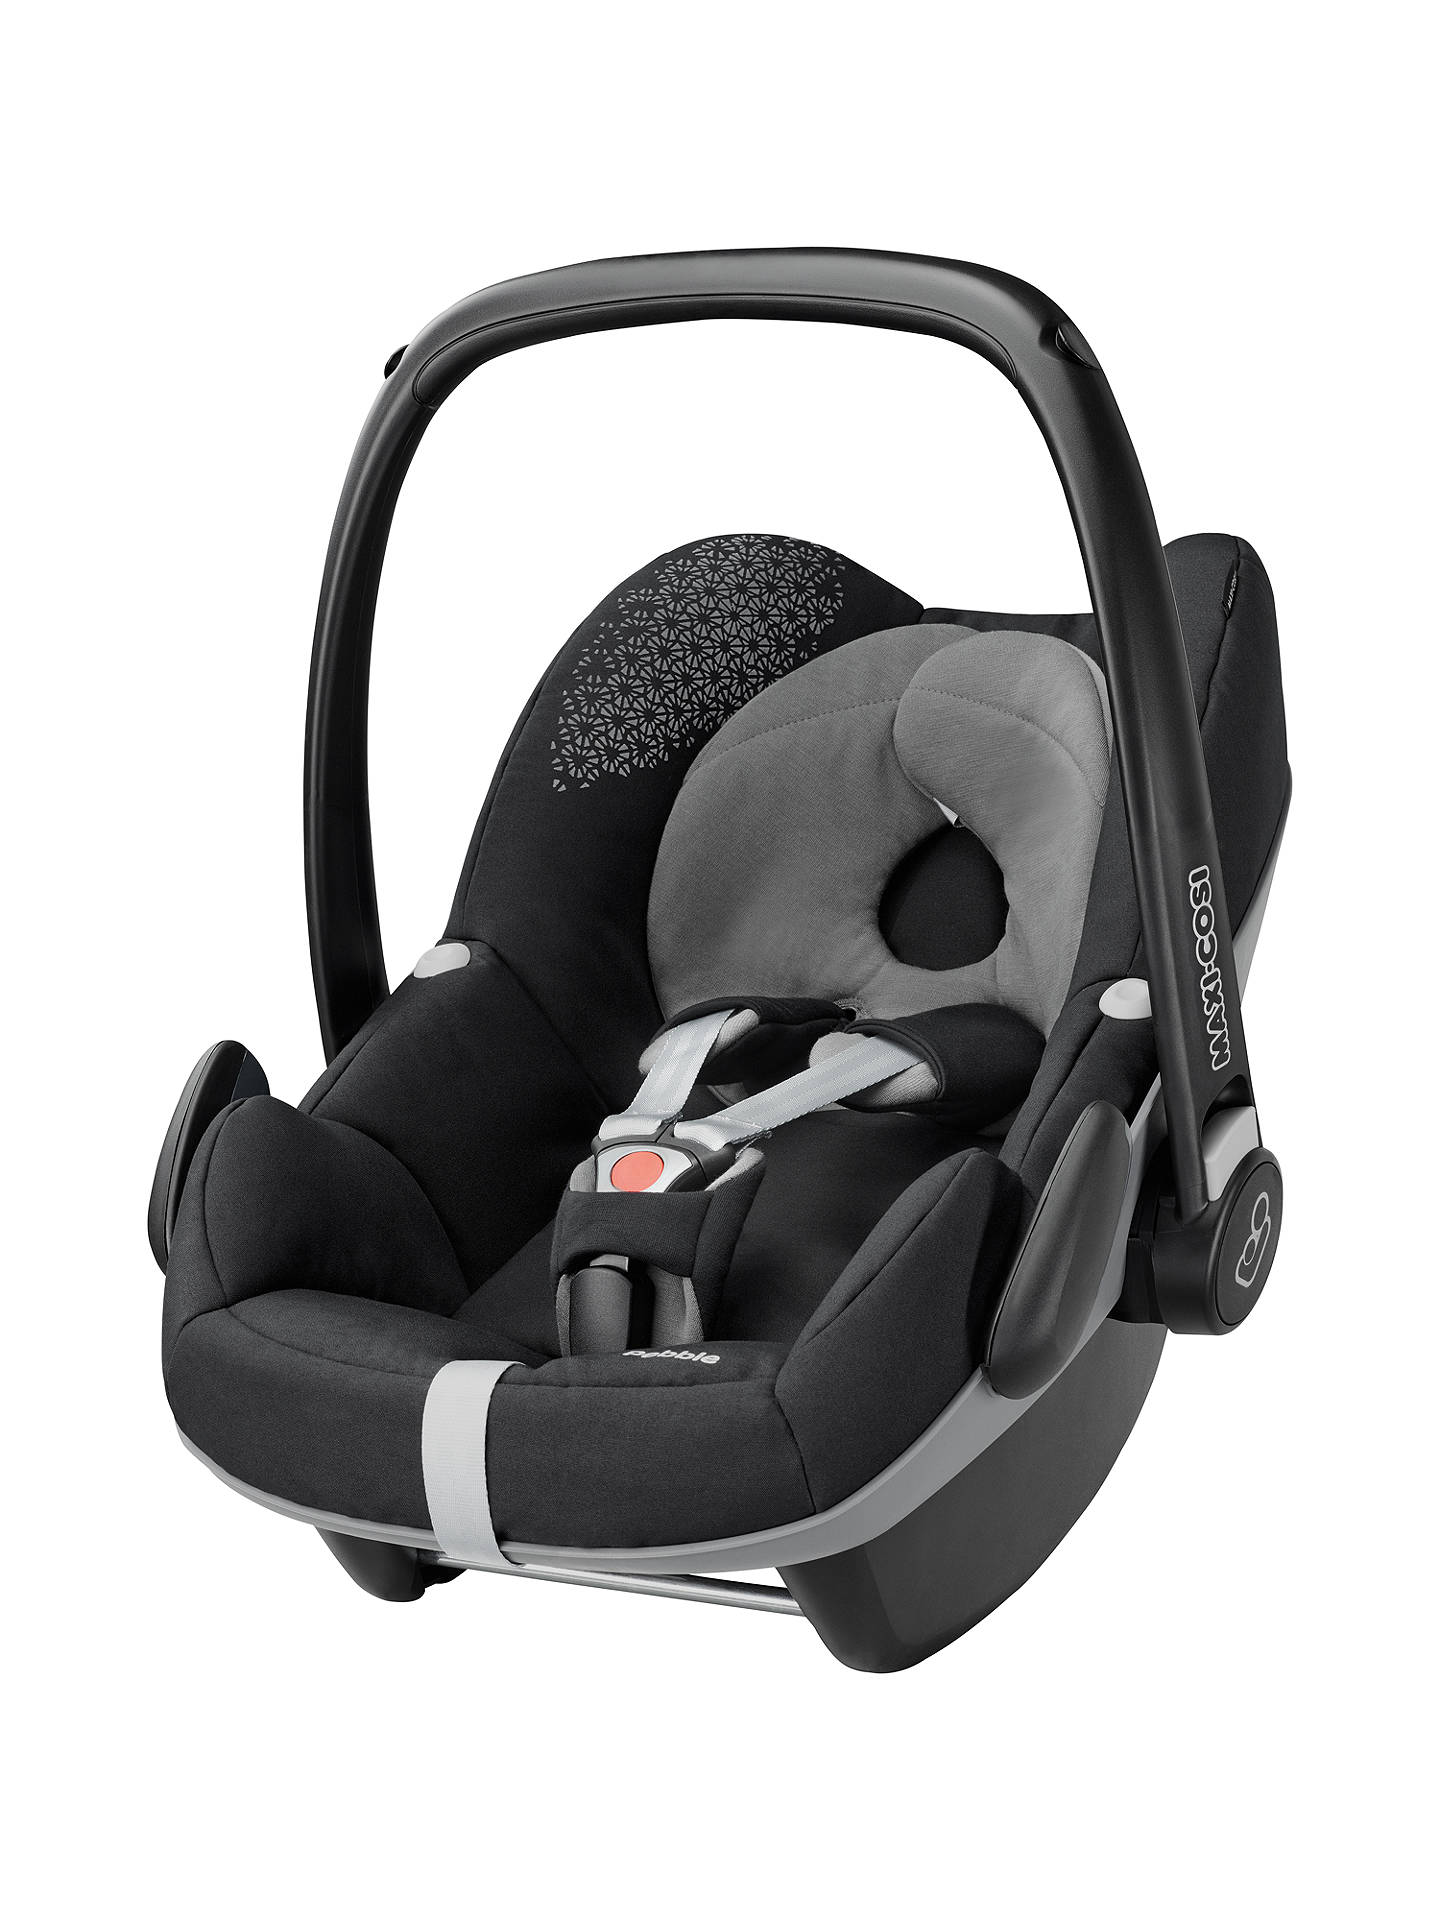 maxi cosi pebble group 0 baby car seat origami black at john lewis partners. Black Bedroom Furniture Sets. Home Design Ideas